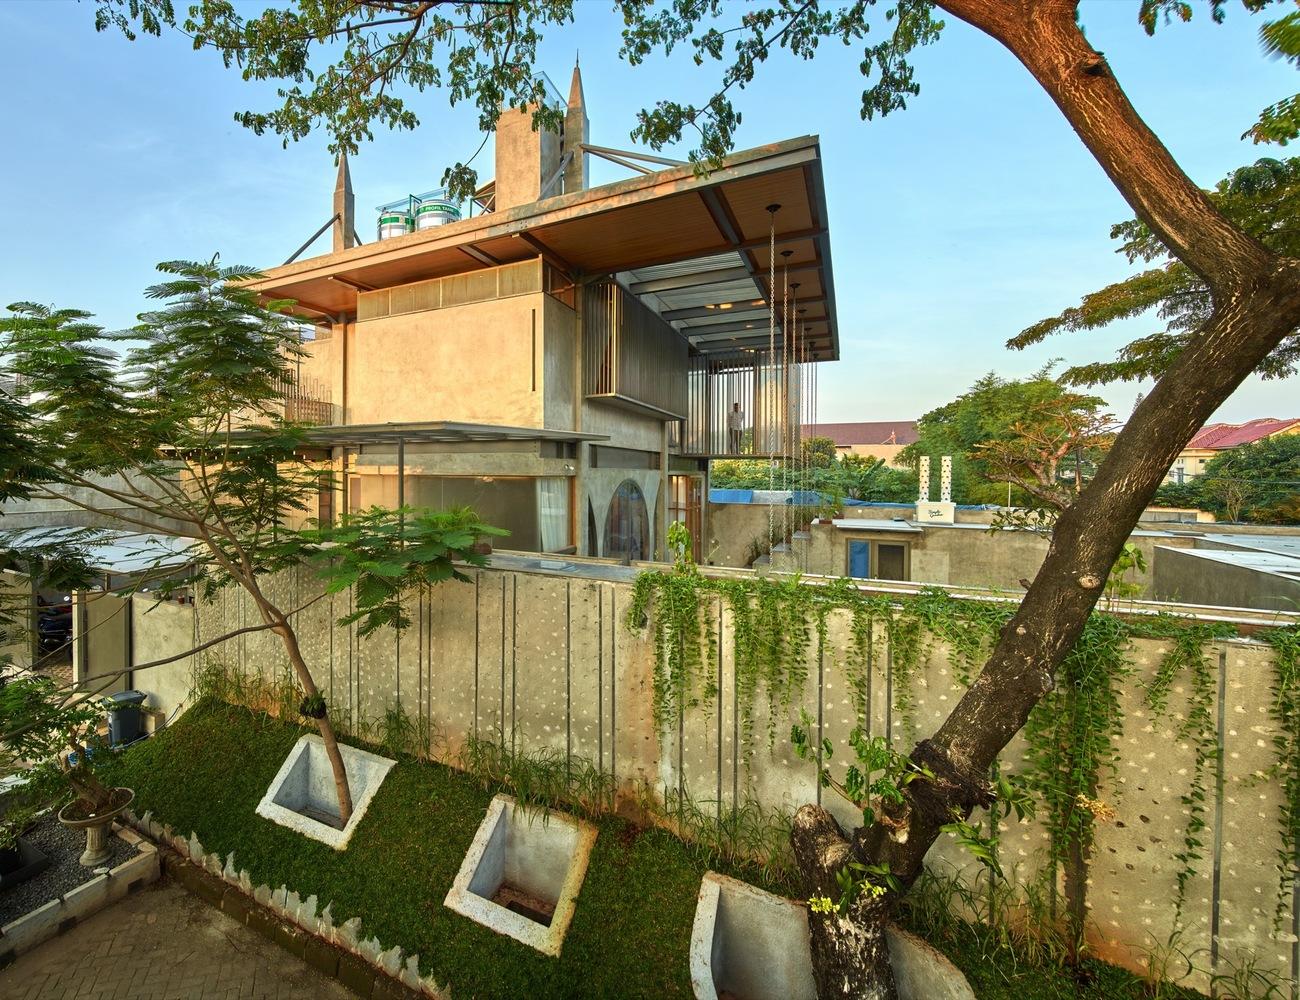 Tembok beton berhiaskan juntaian lee kuan yew melindungi bangunan di dalamnya (Sumber: archdaily)